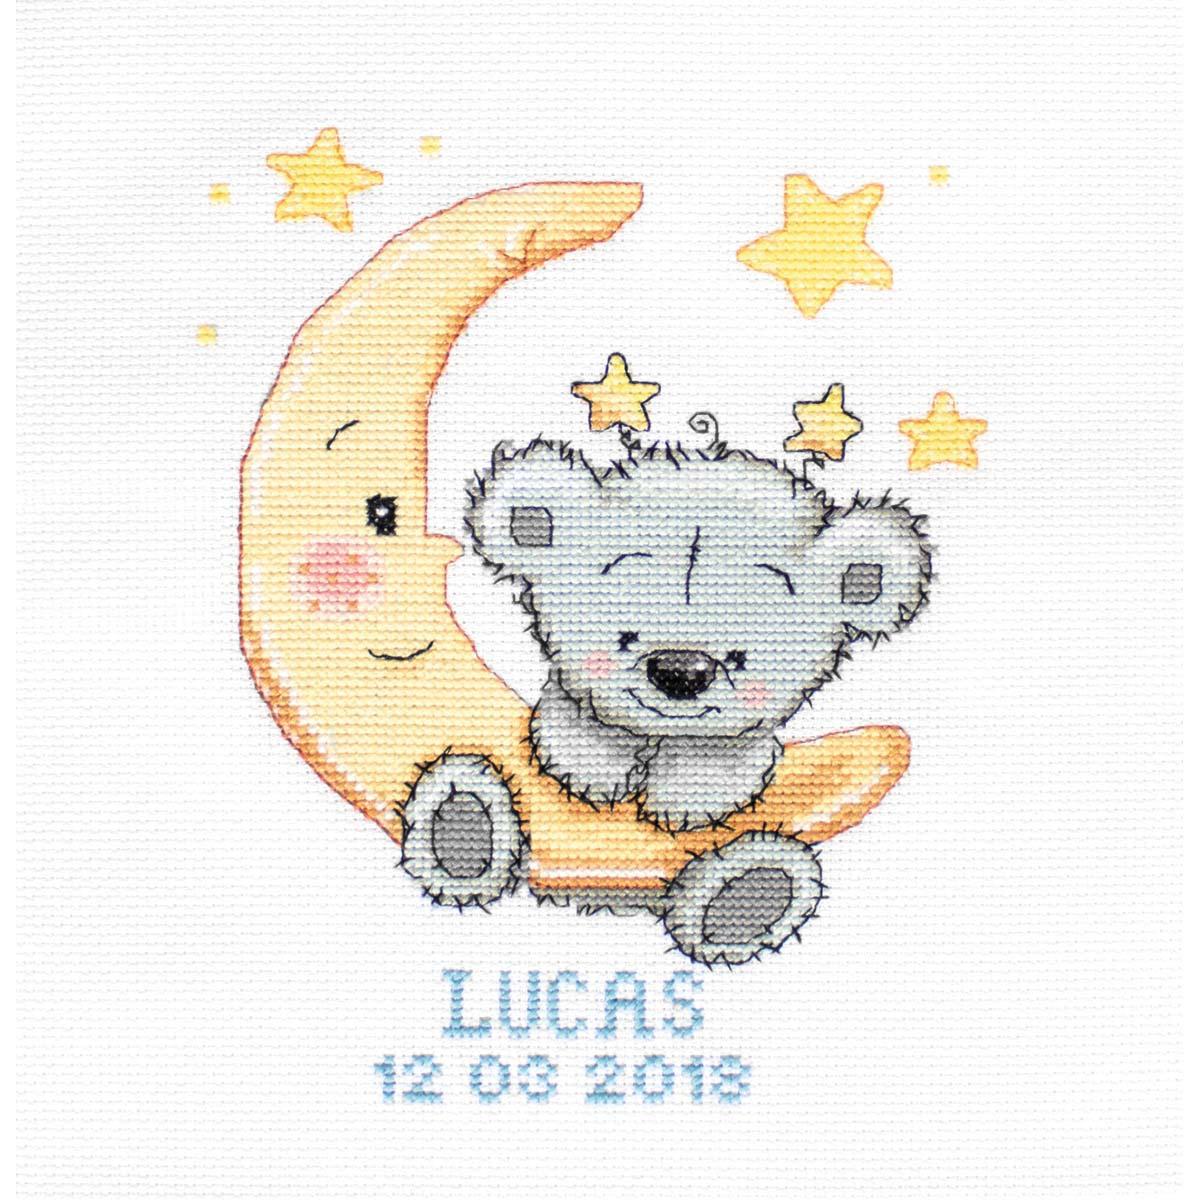 B1146 Набор для вышивания 'Лукас' 13*16,5 см, Luca-S